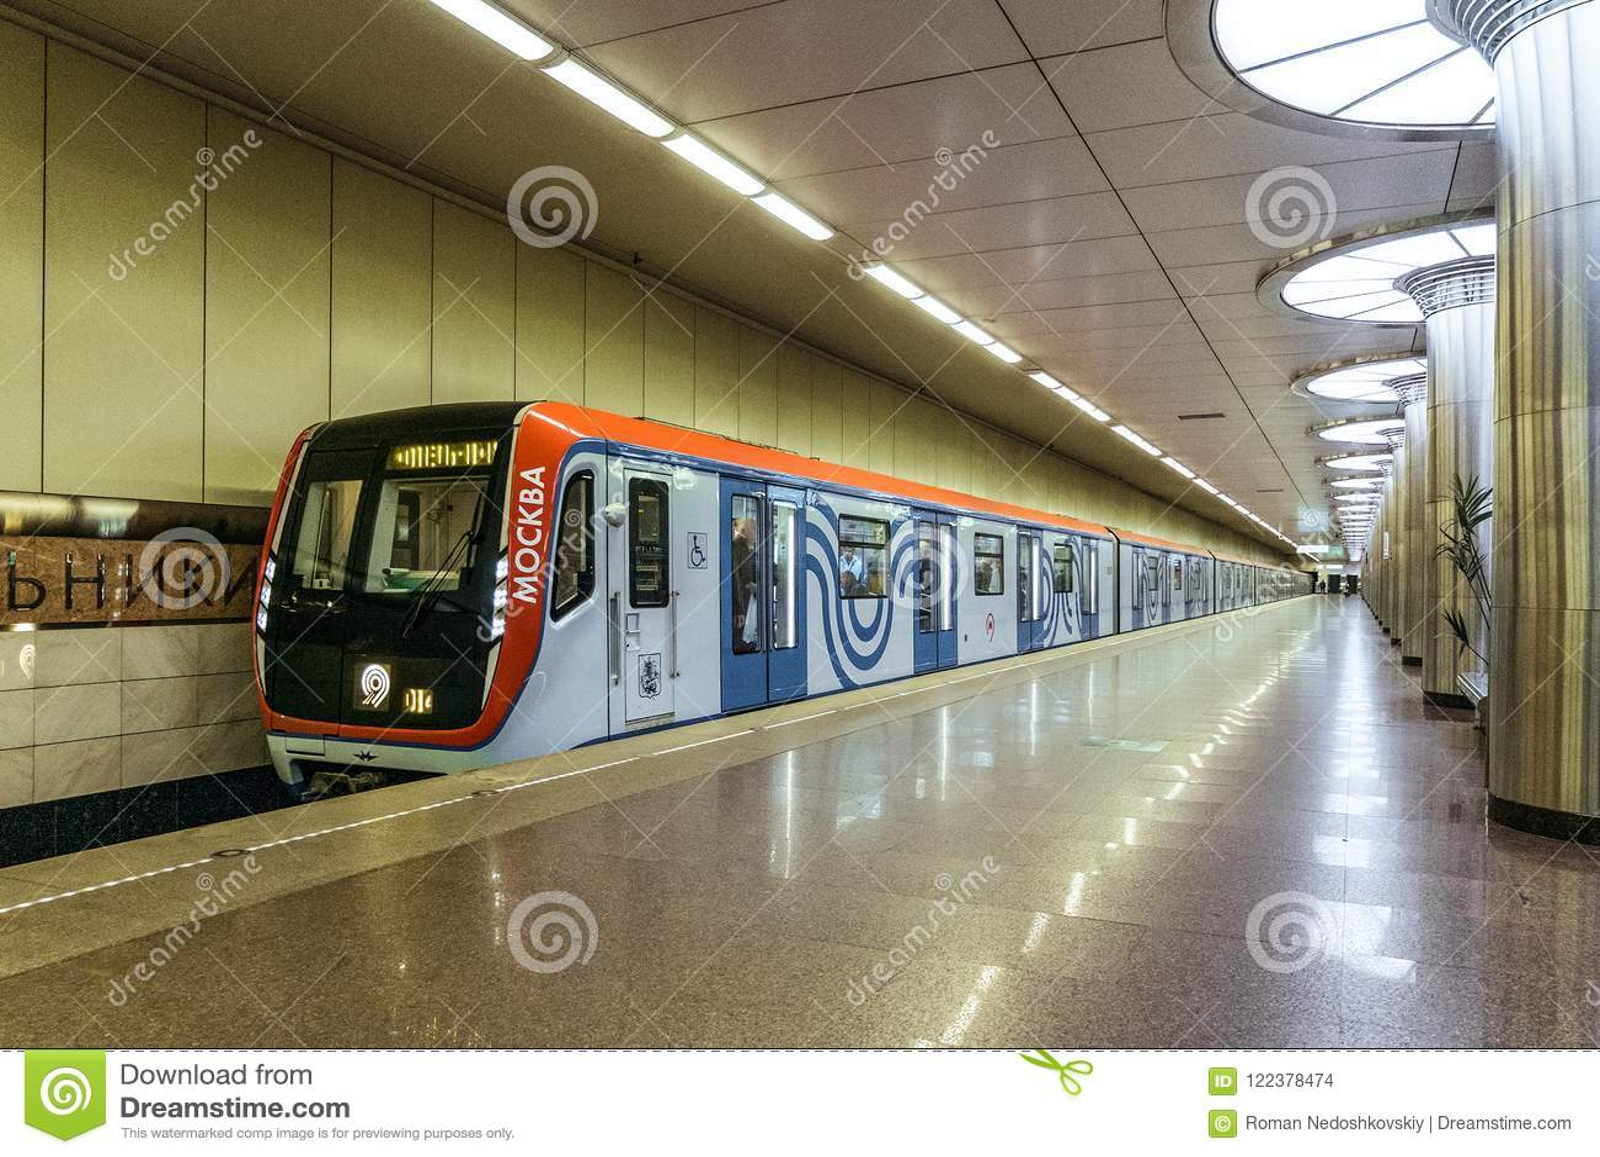 How to get from metro Kotelniki to Lyubertsy 38